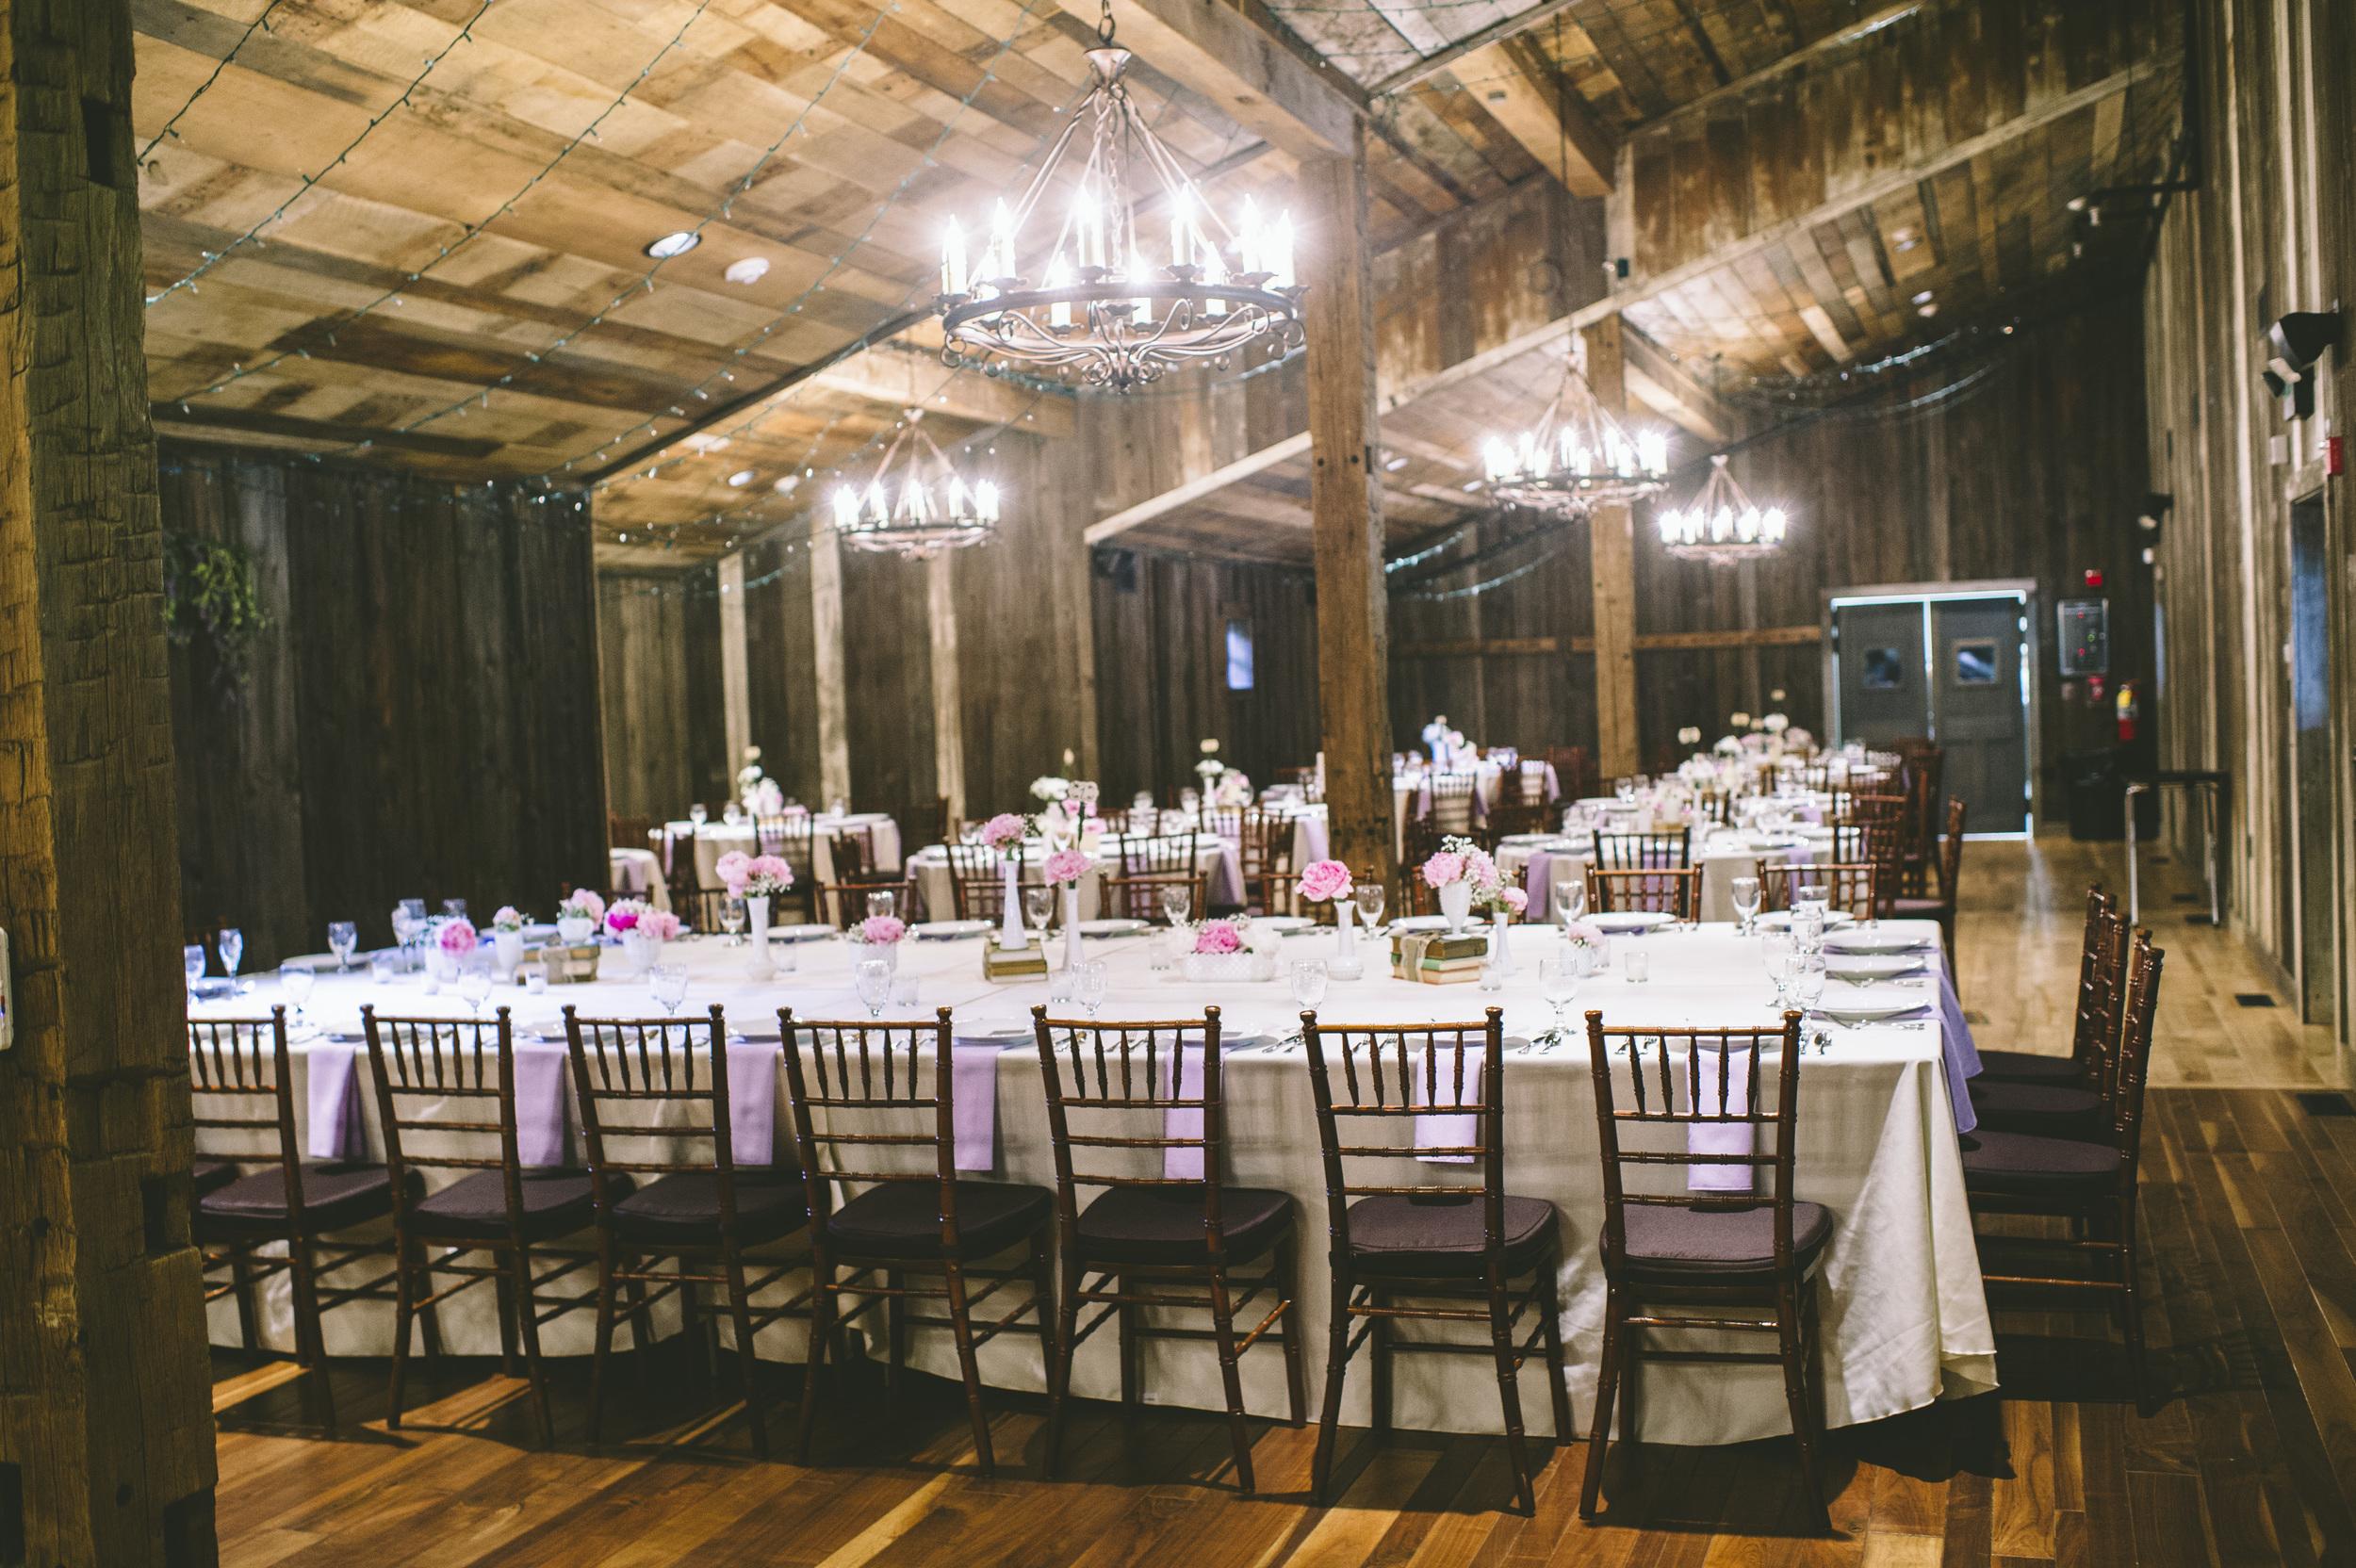 The Oak Lodge dining hall